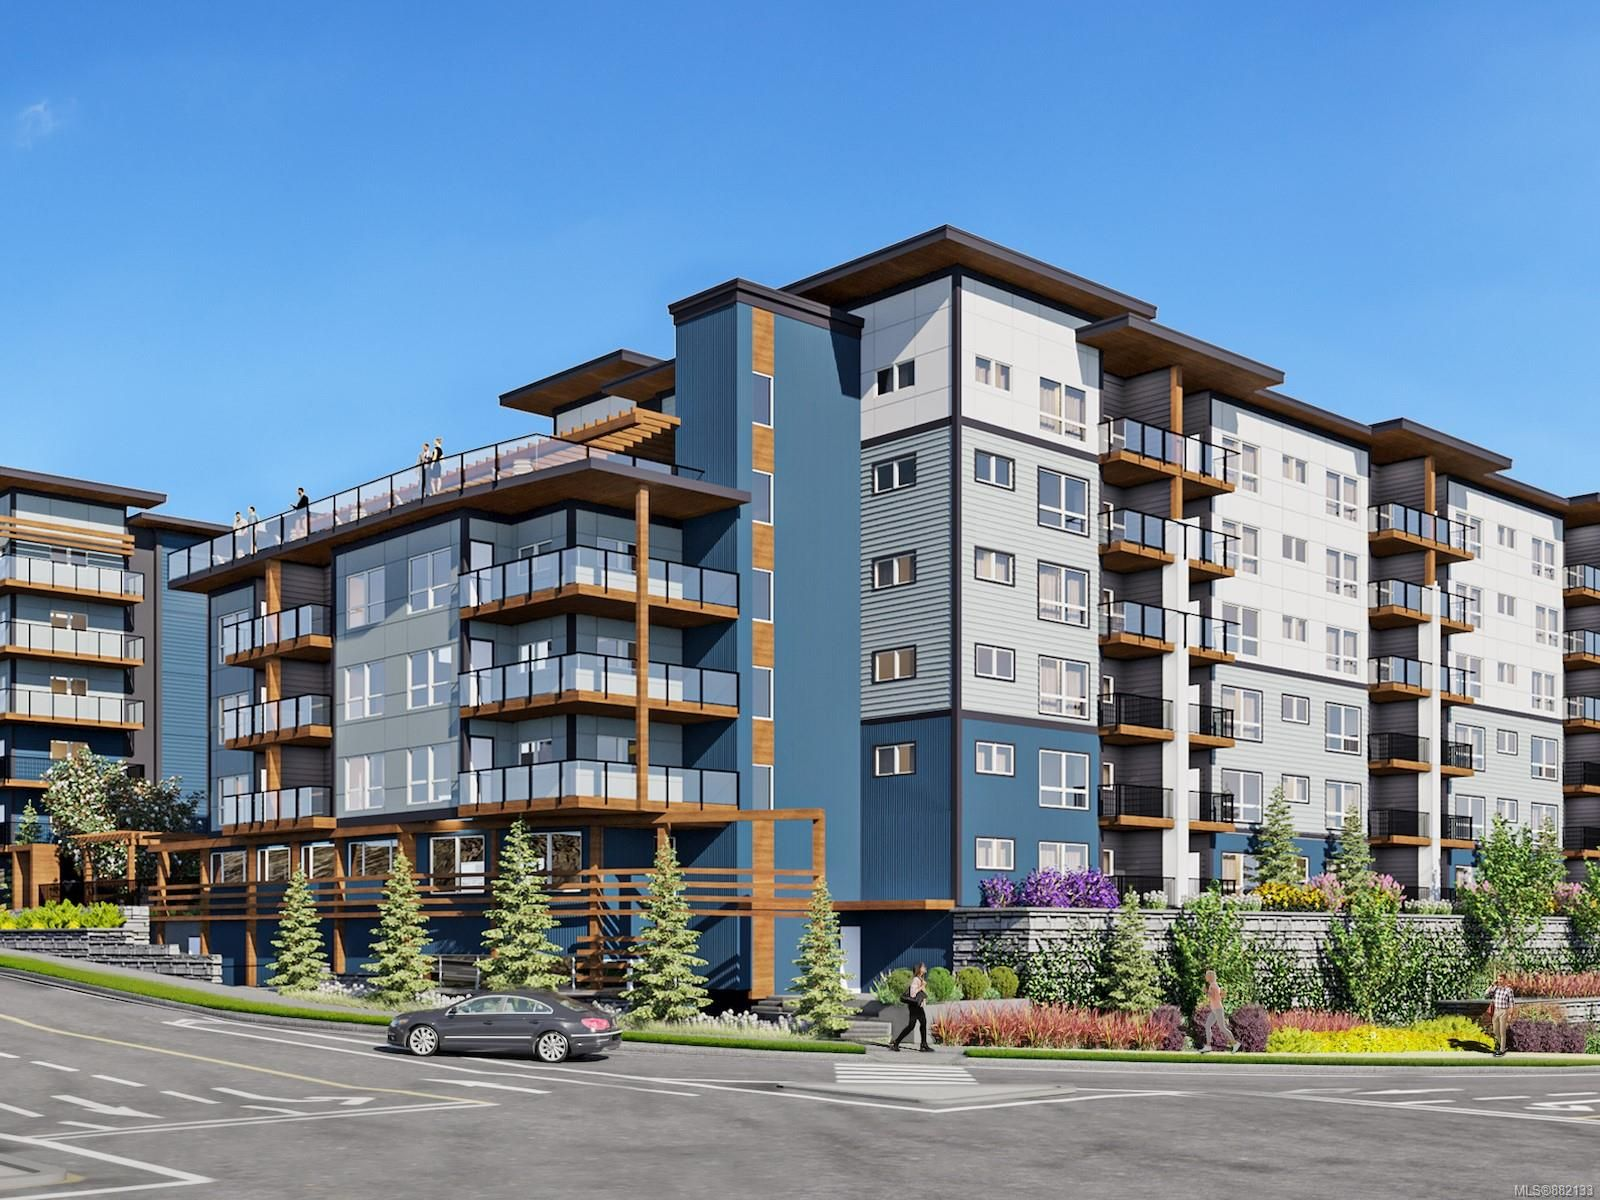 Main Photo: 101B 2465 Gateway Rd in : La Florence Lake Condo for sale (Langford)  : MLS®# 882133